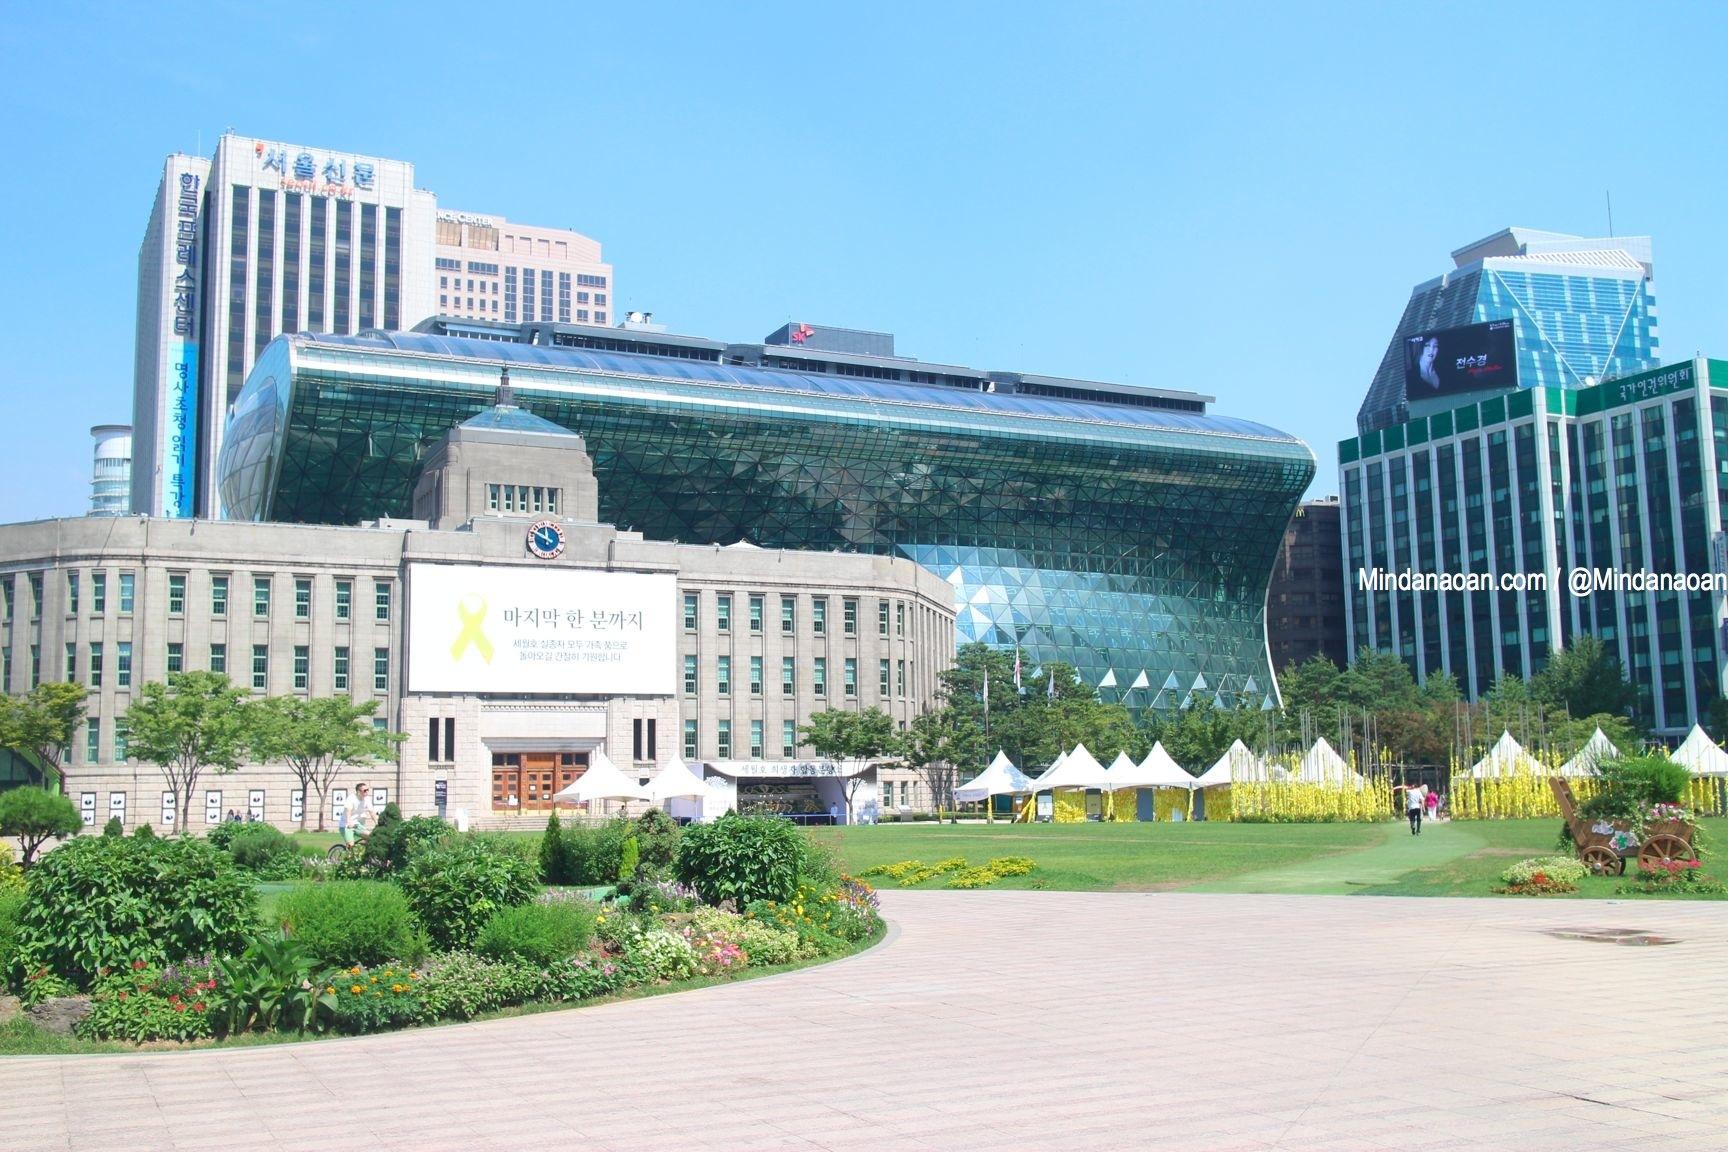 Mindanaoan In Korea Travel Series: Seoul City Hall